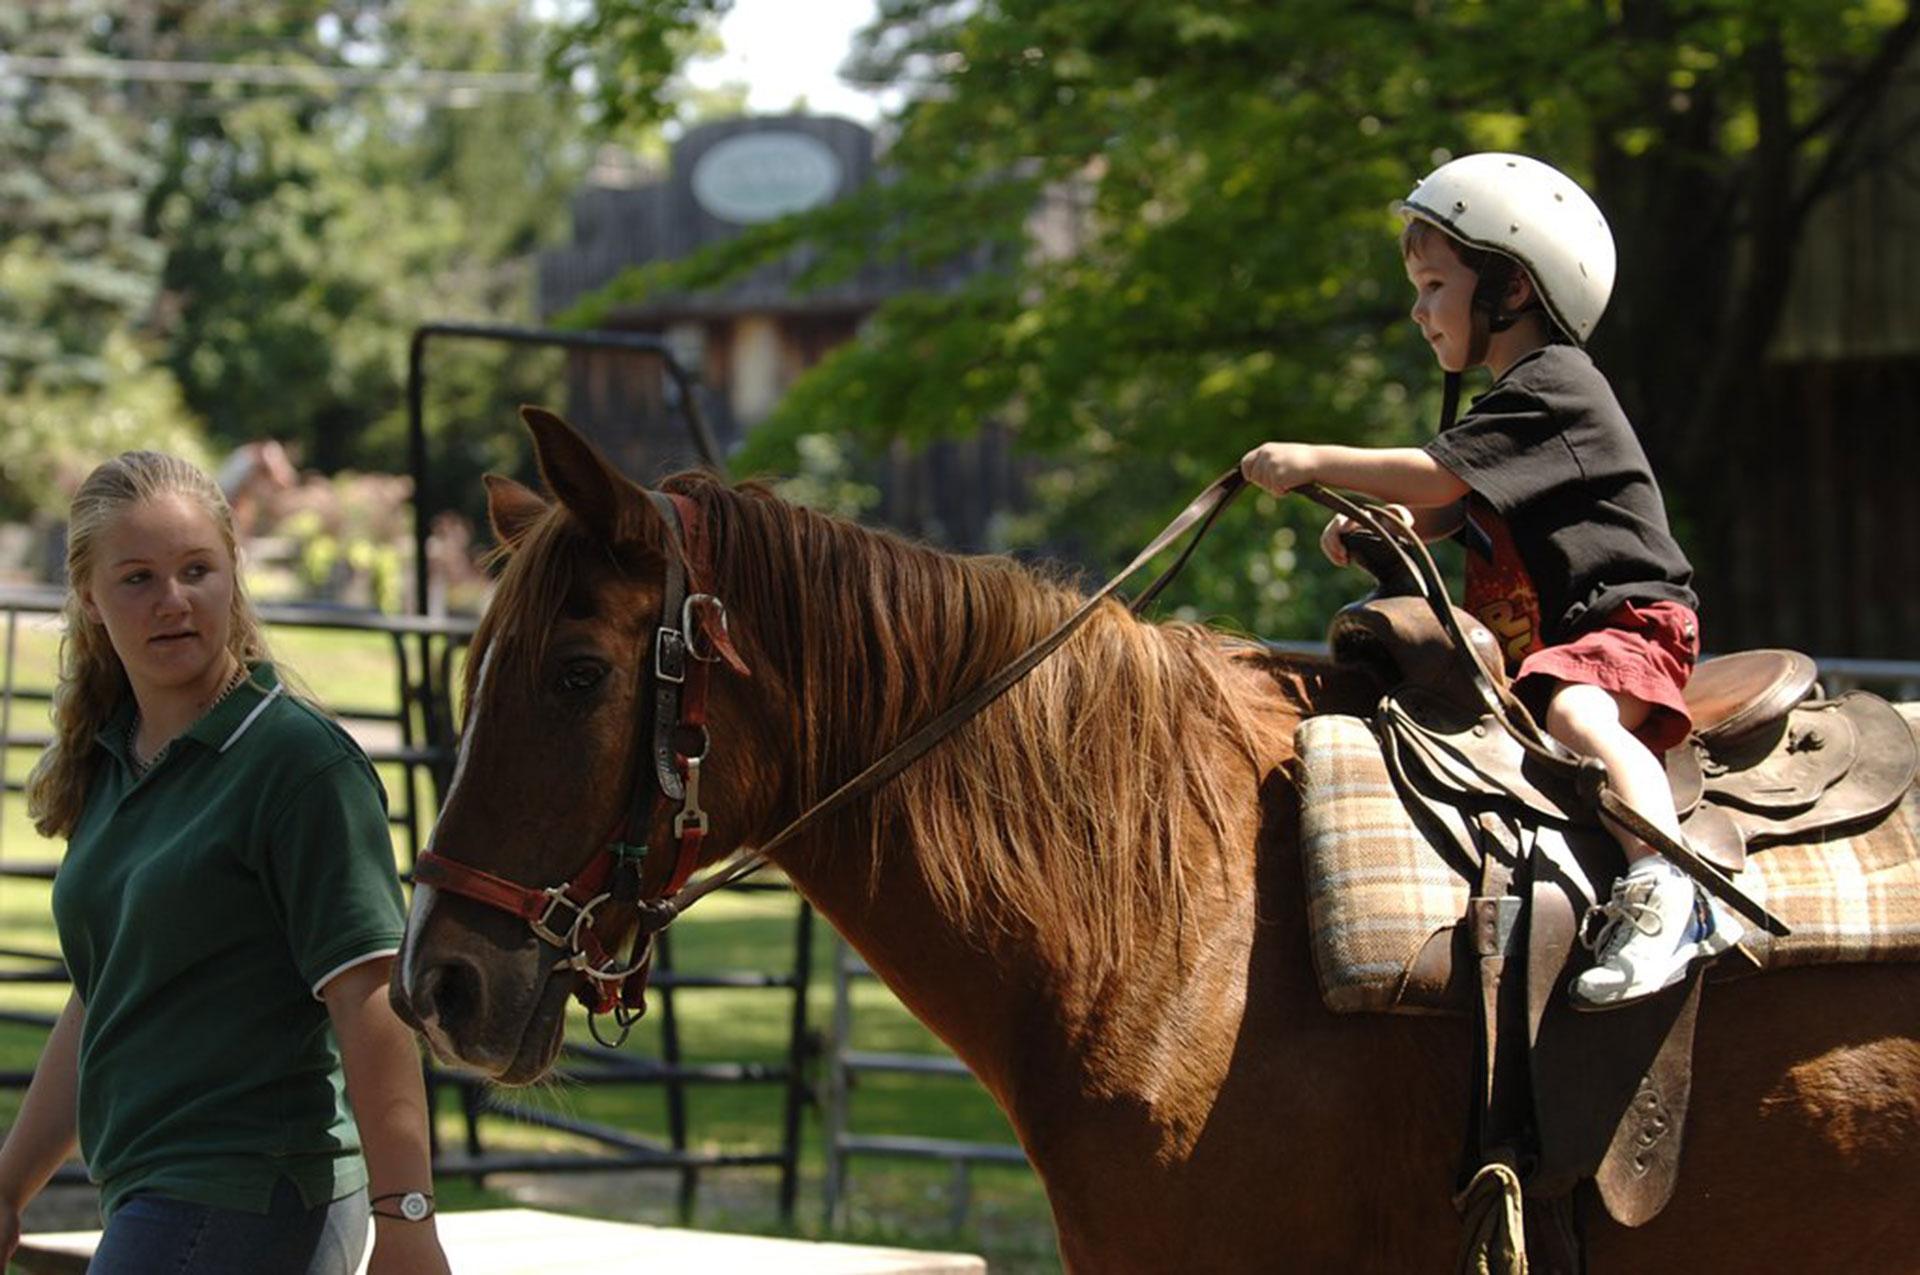 Horseback Riding at Pine Ridge Dude Ranch; Courtesy of Pine Ridge Dude Ranch